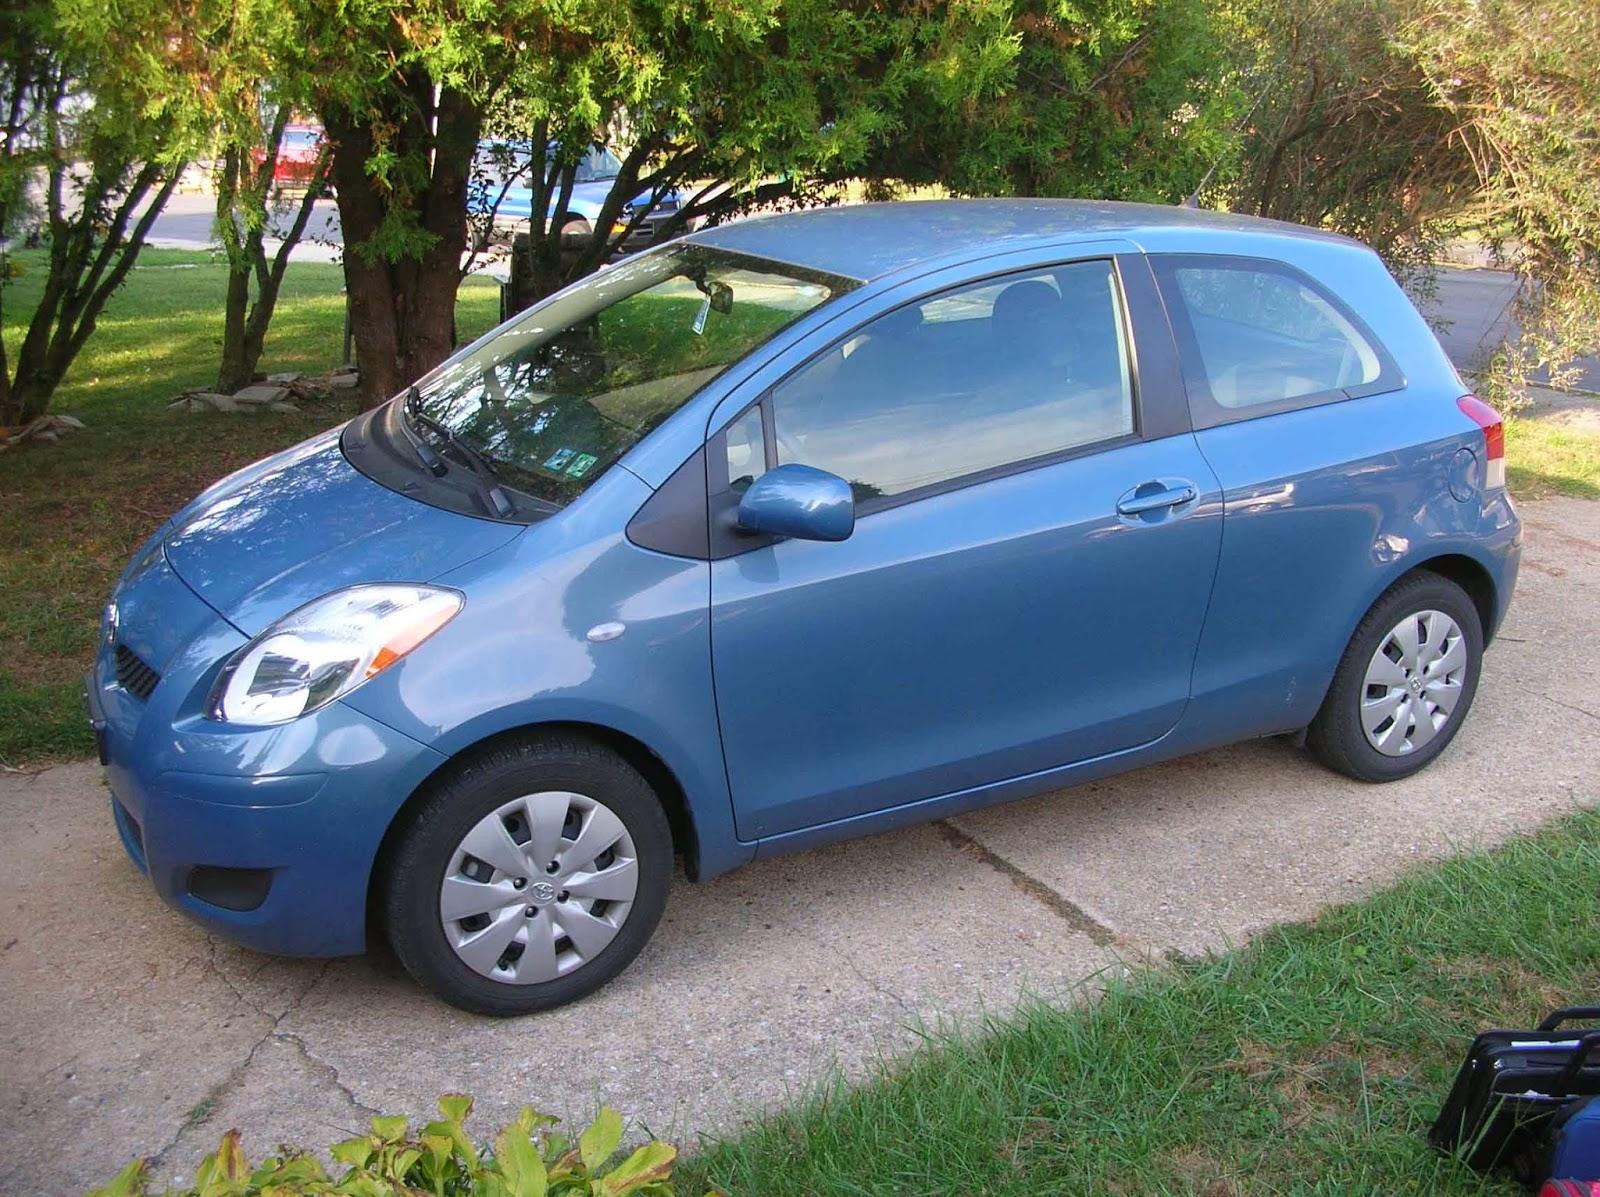 J.S. Brooks Presents: Toyota Yaris Savings on a Long Trip, More MPG